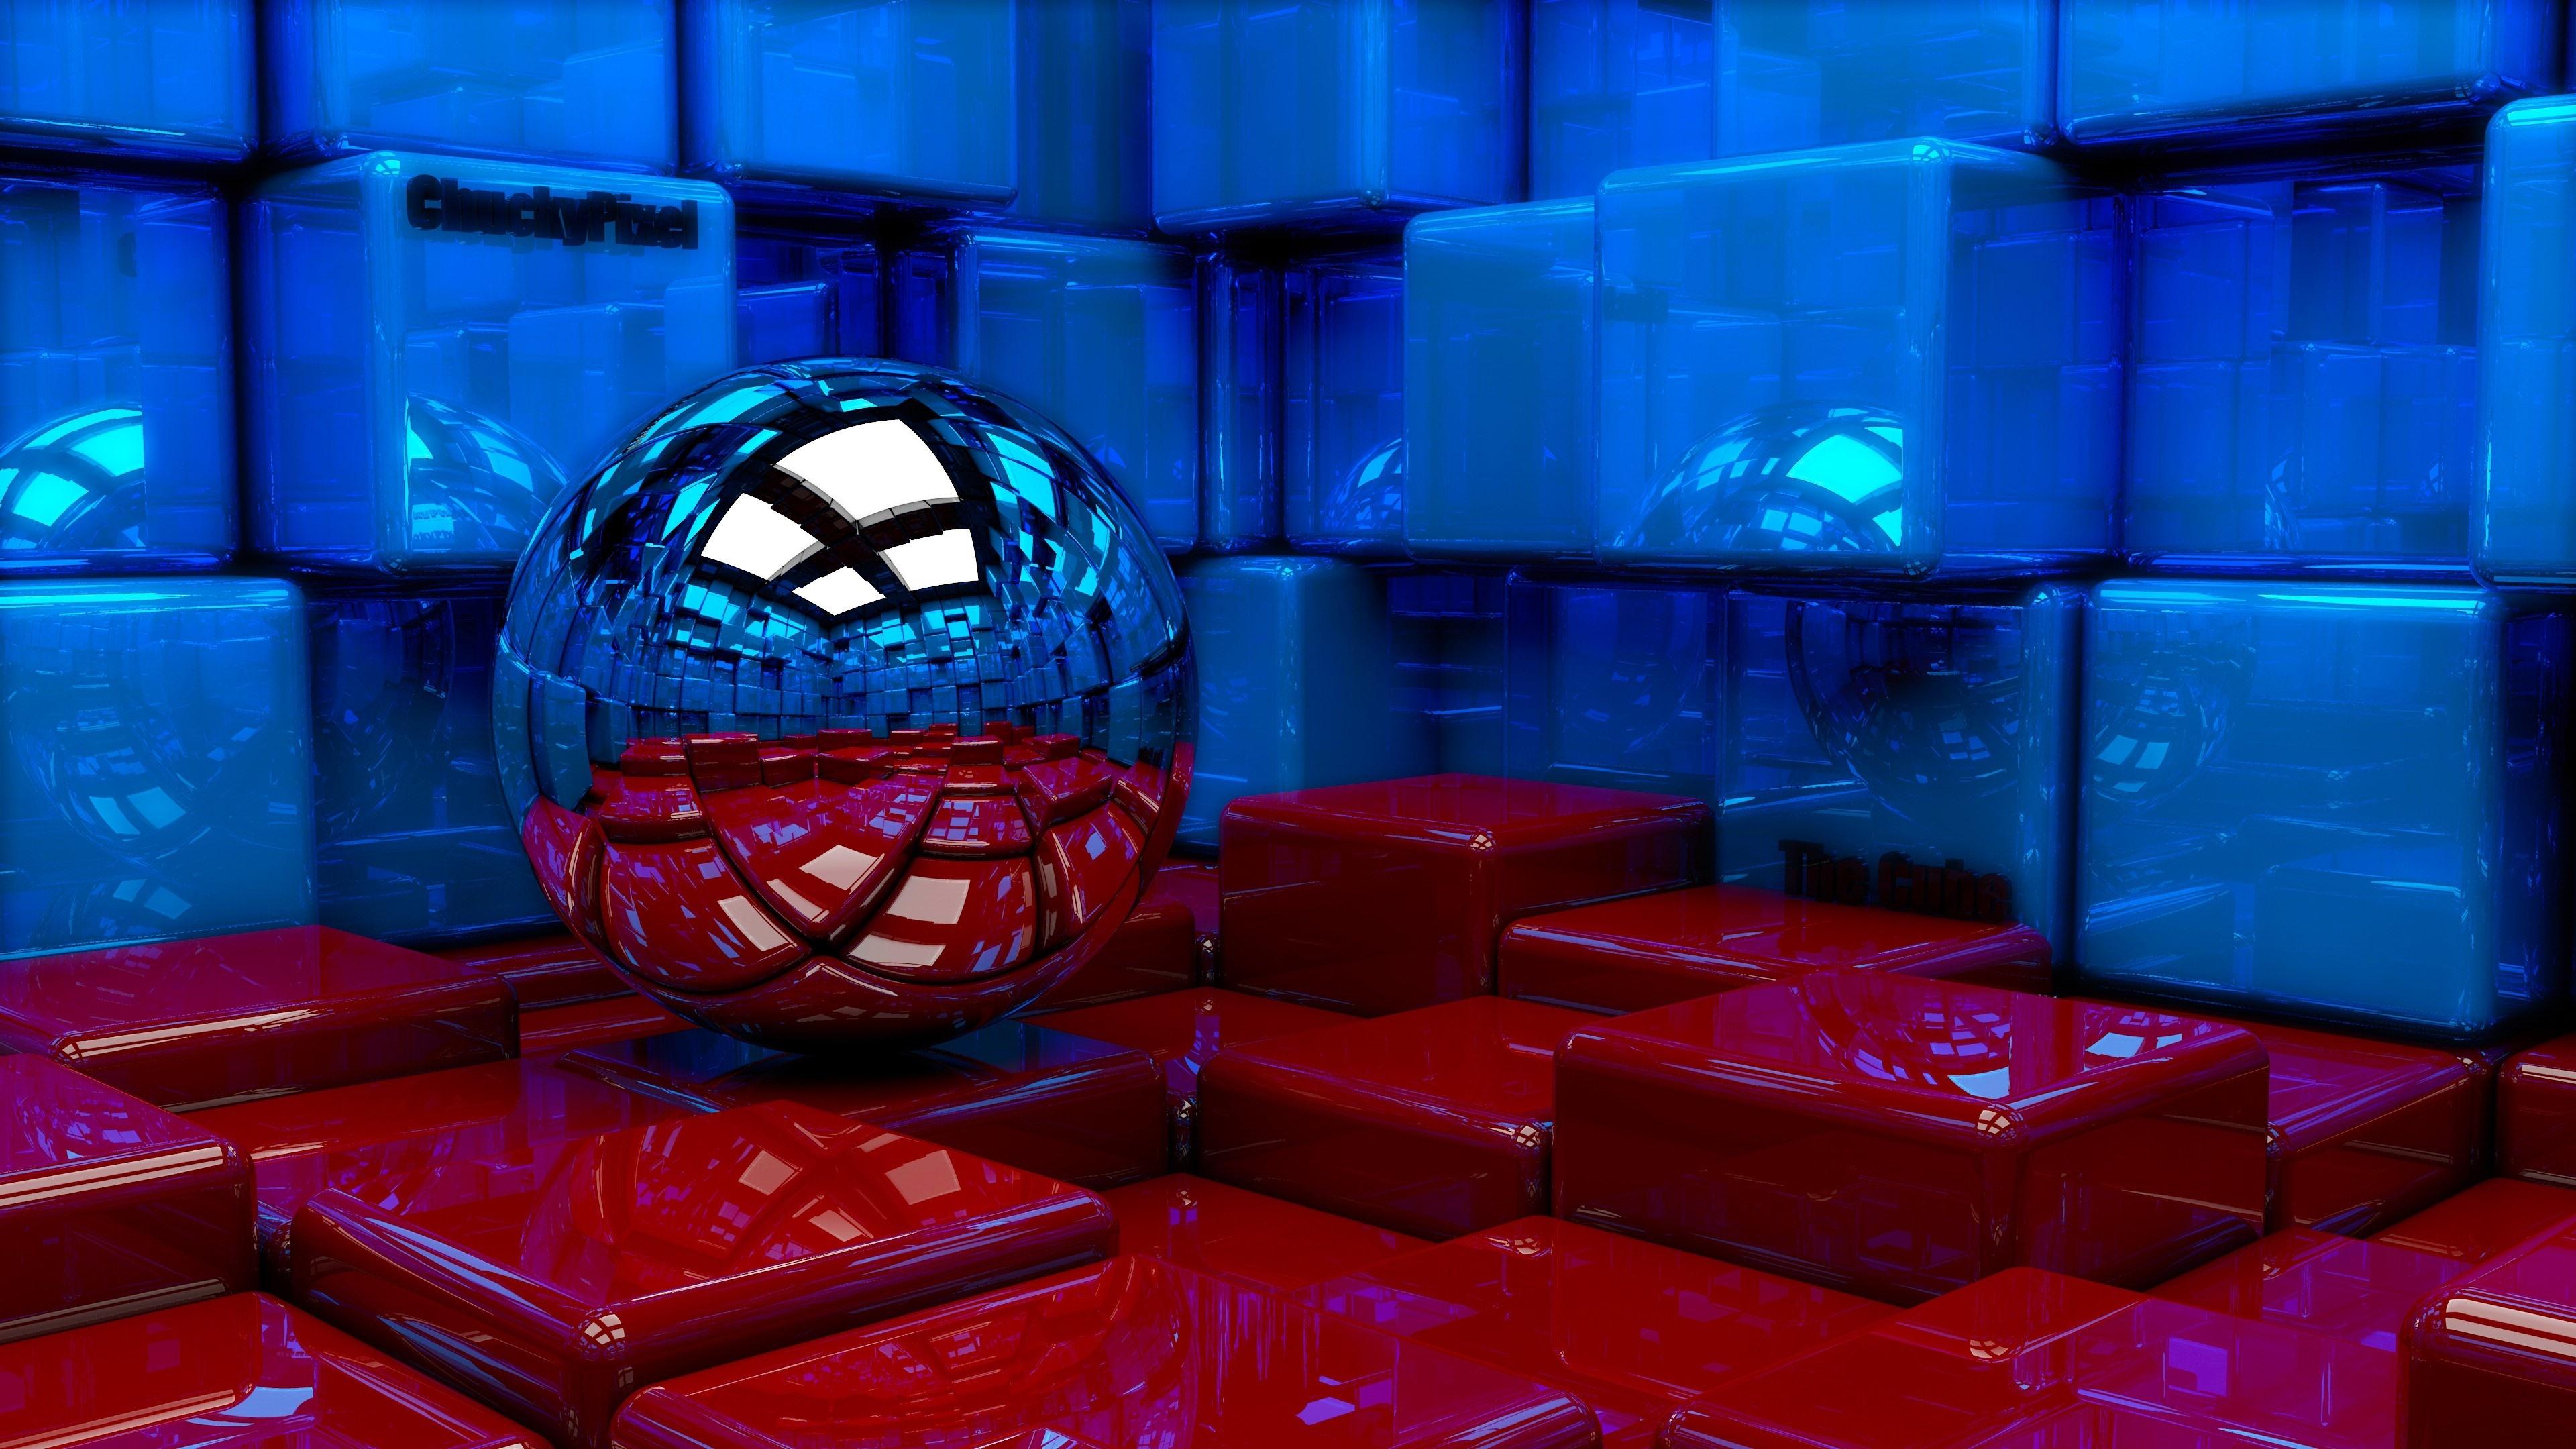 Wallpaper 3d Design Blue And Red Cubes Ball 3840x2160 Uhd